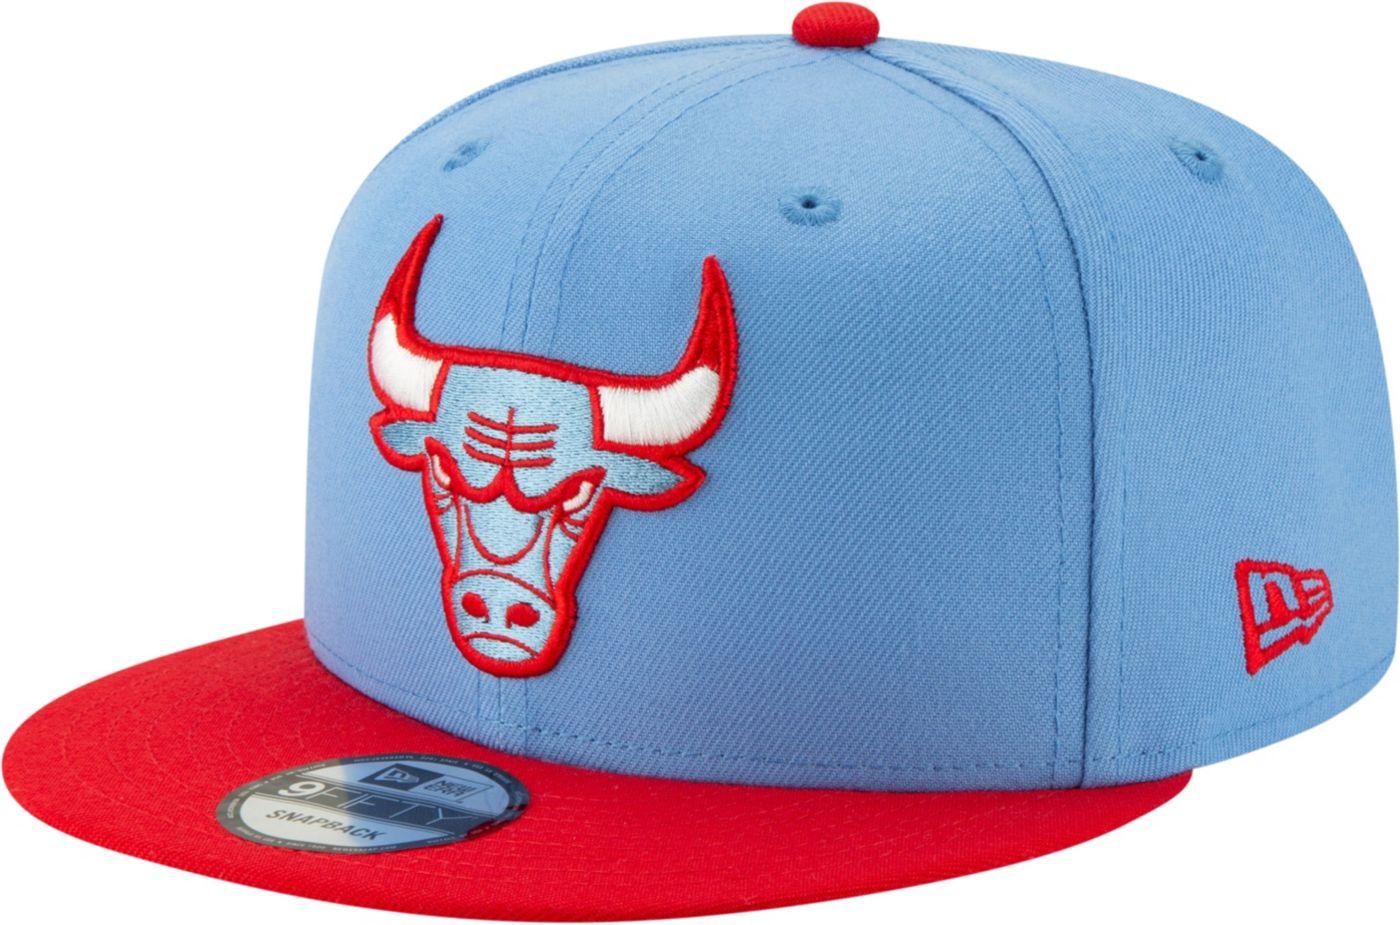 New Era Men's Chicago Bulls 9Fifty City Edition Adjustable Snapback Hat